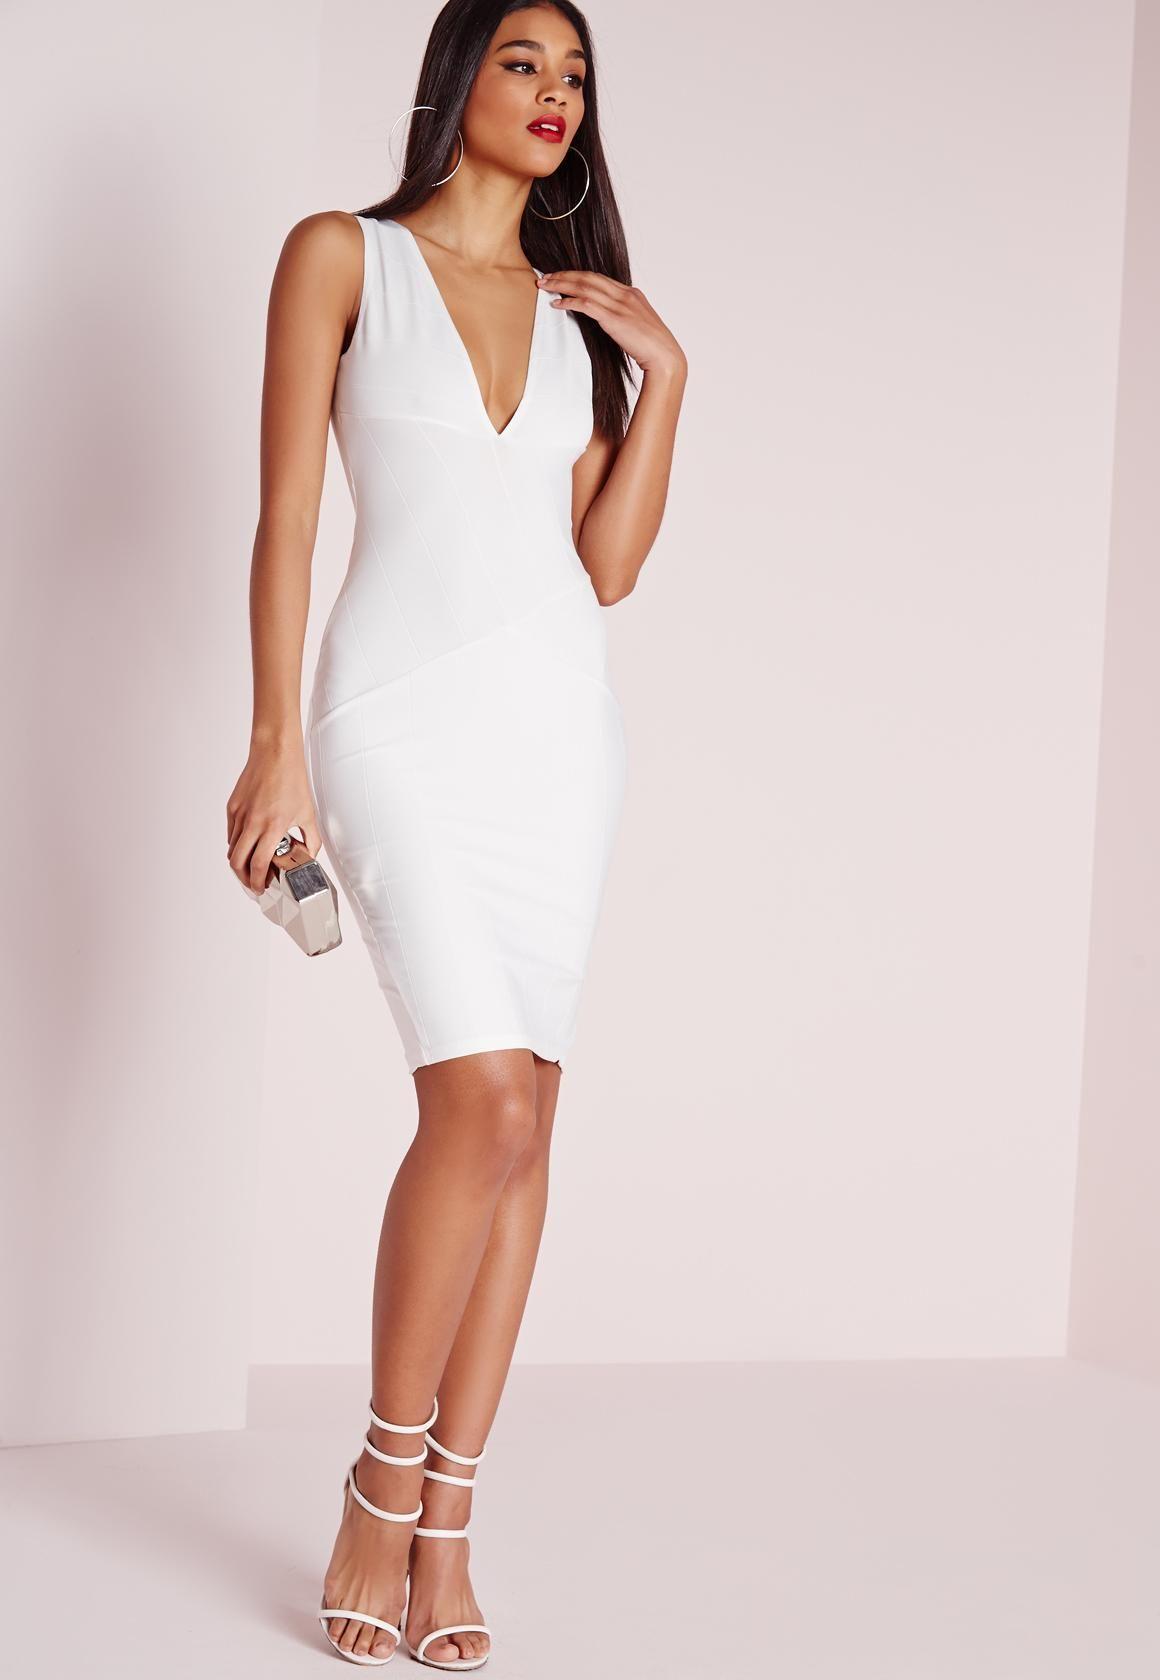 10++ White bodycon bandage dress info